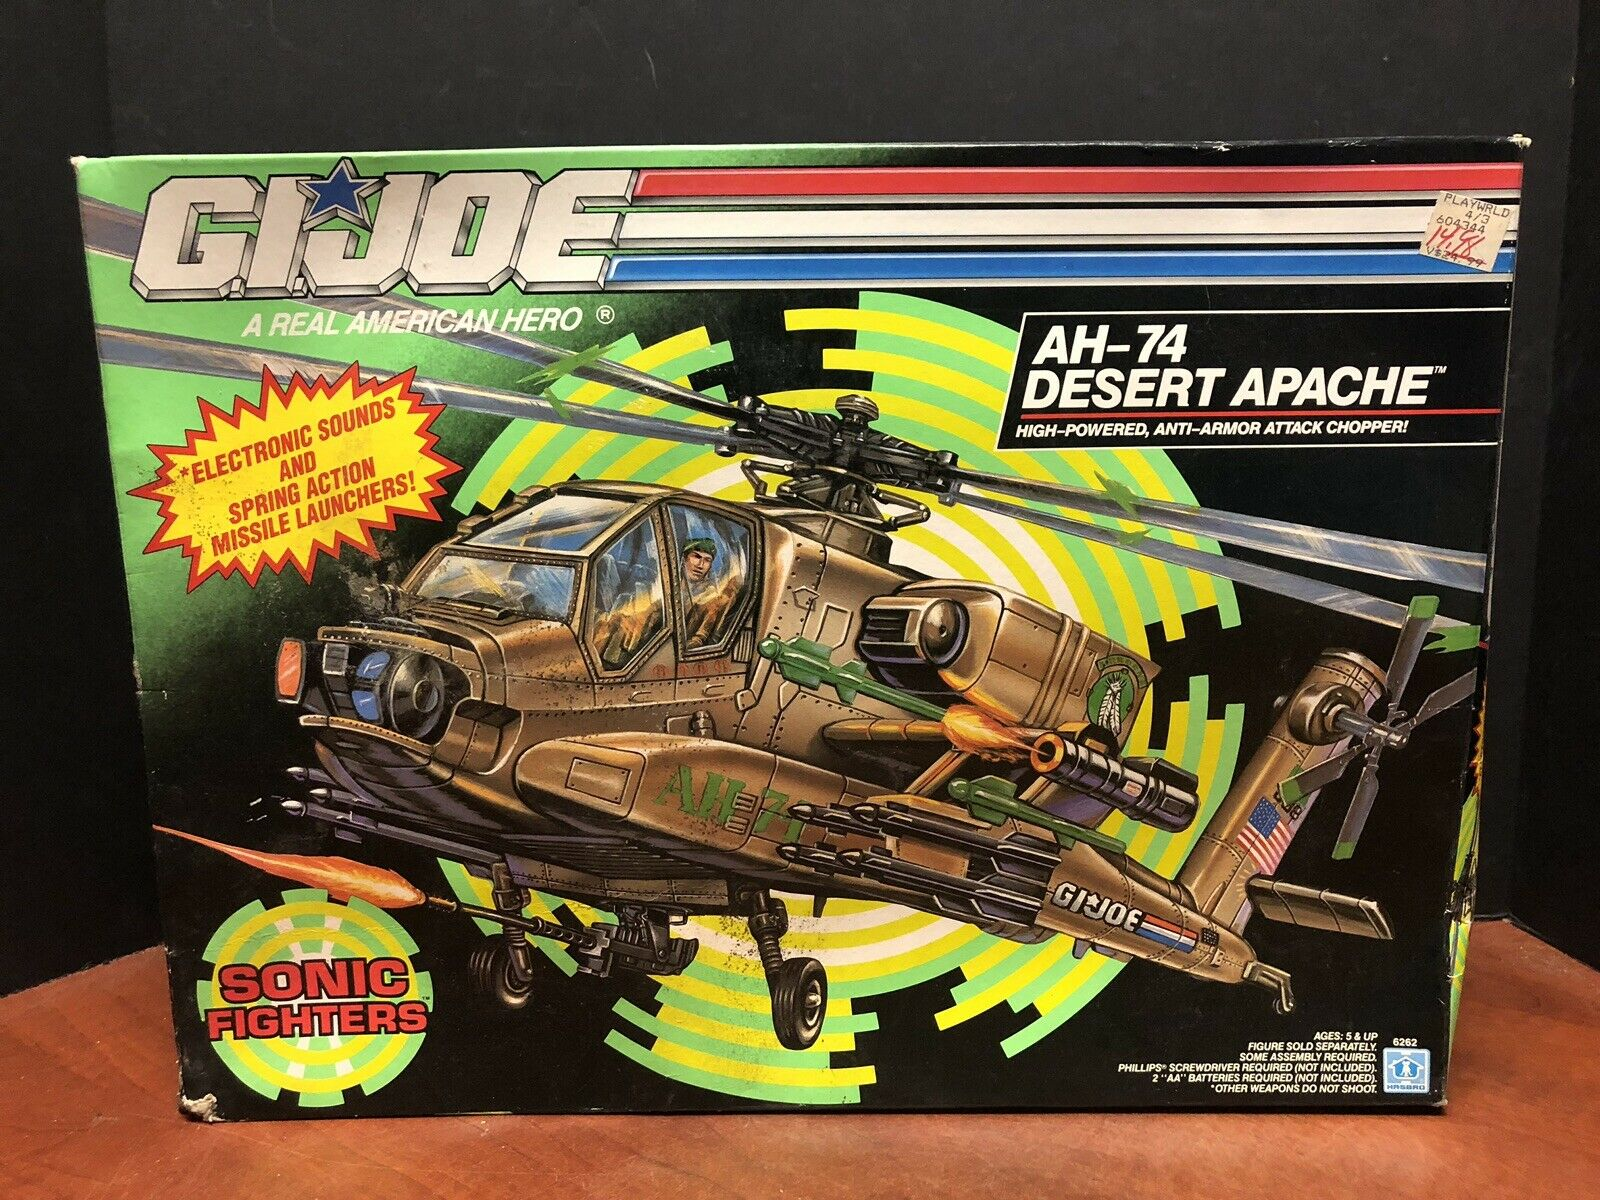 GI Joe 1992 AH-74 Desert Apache Sealed Dela0492